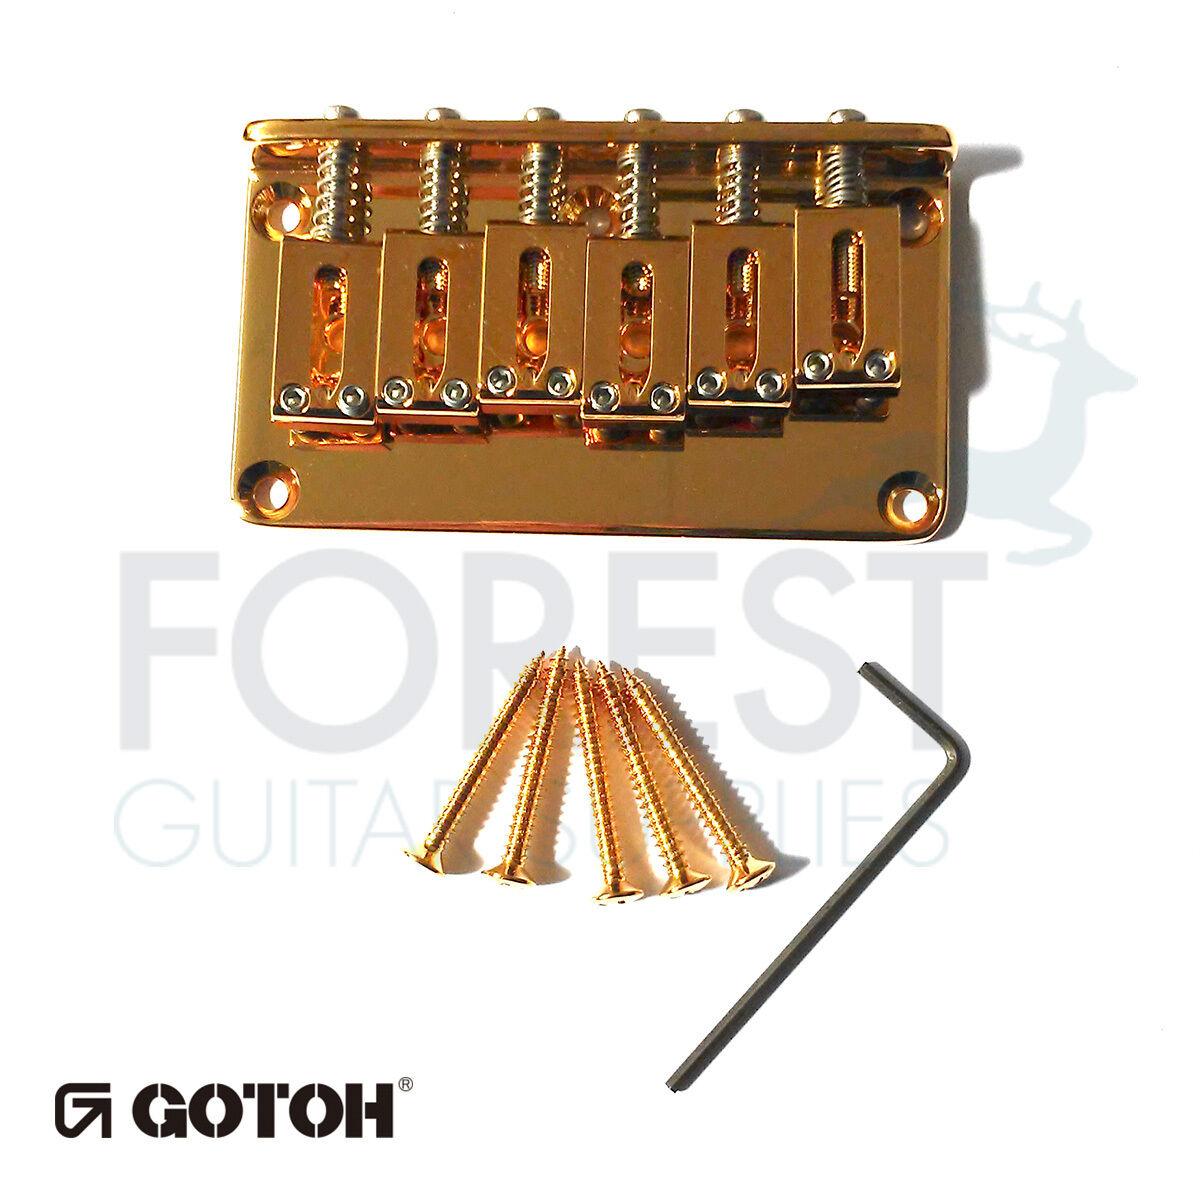 Gotoh guitar Hardtail fixed bridge GTC101, Brass saddle, oro, for Tele or Strat